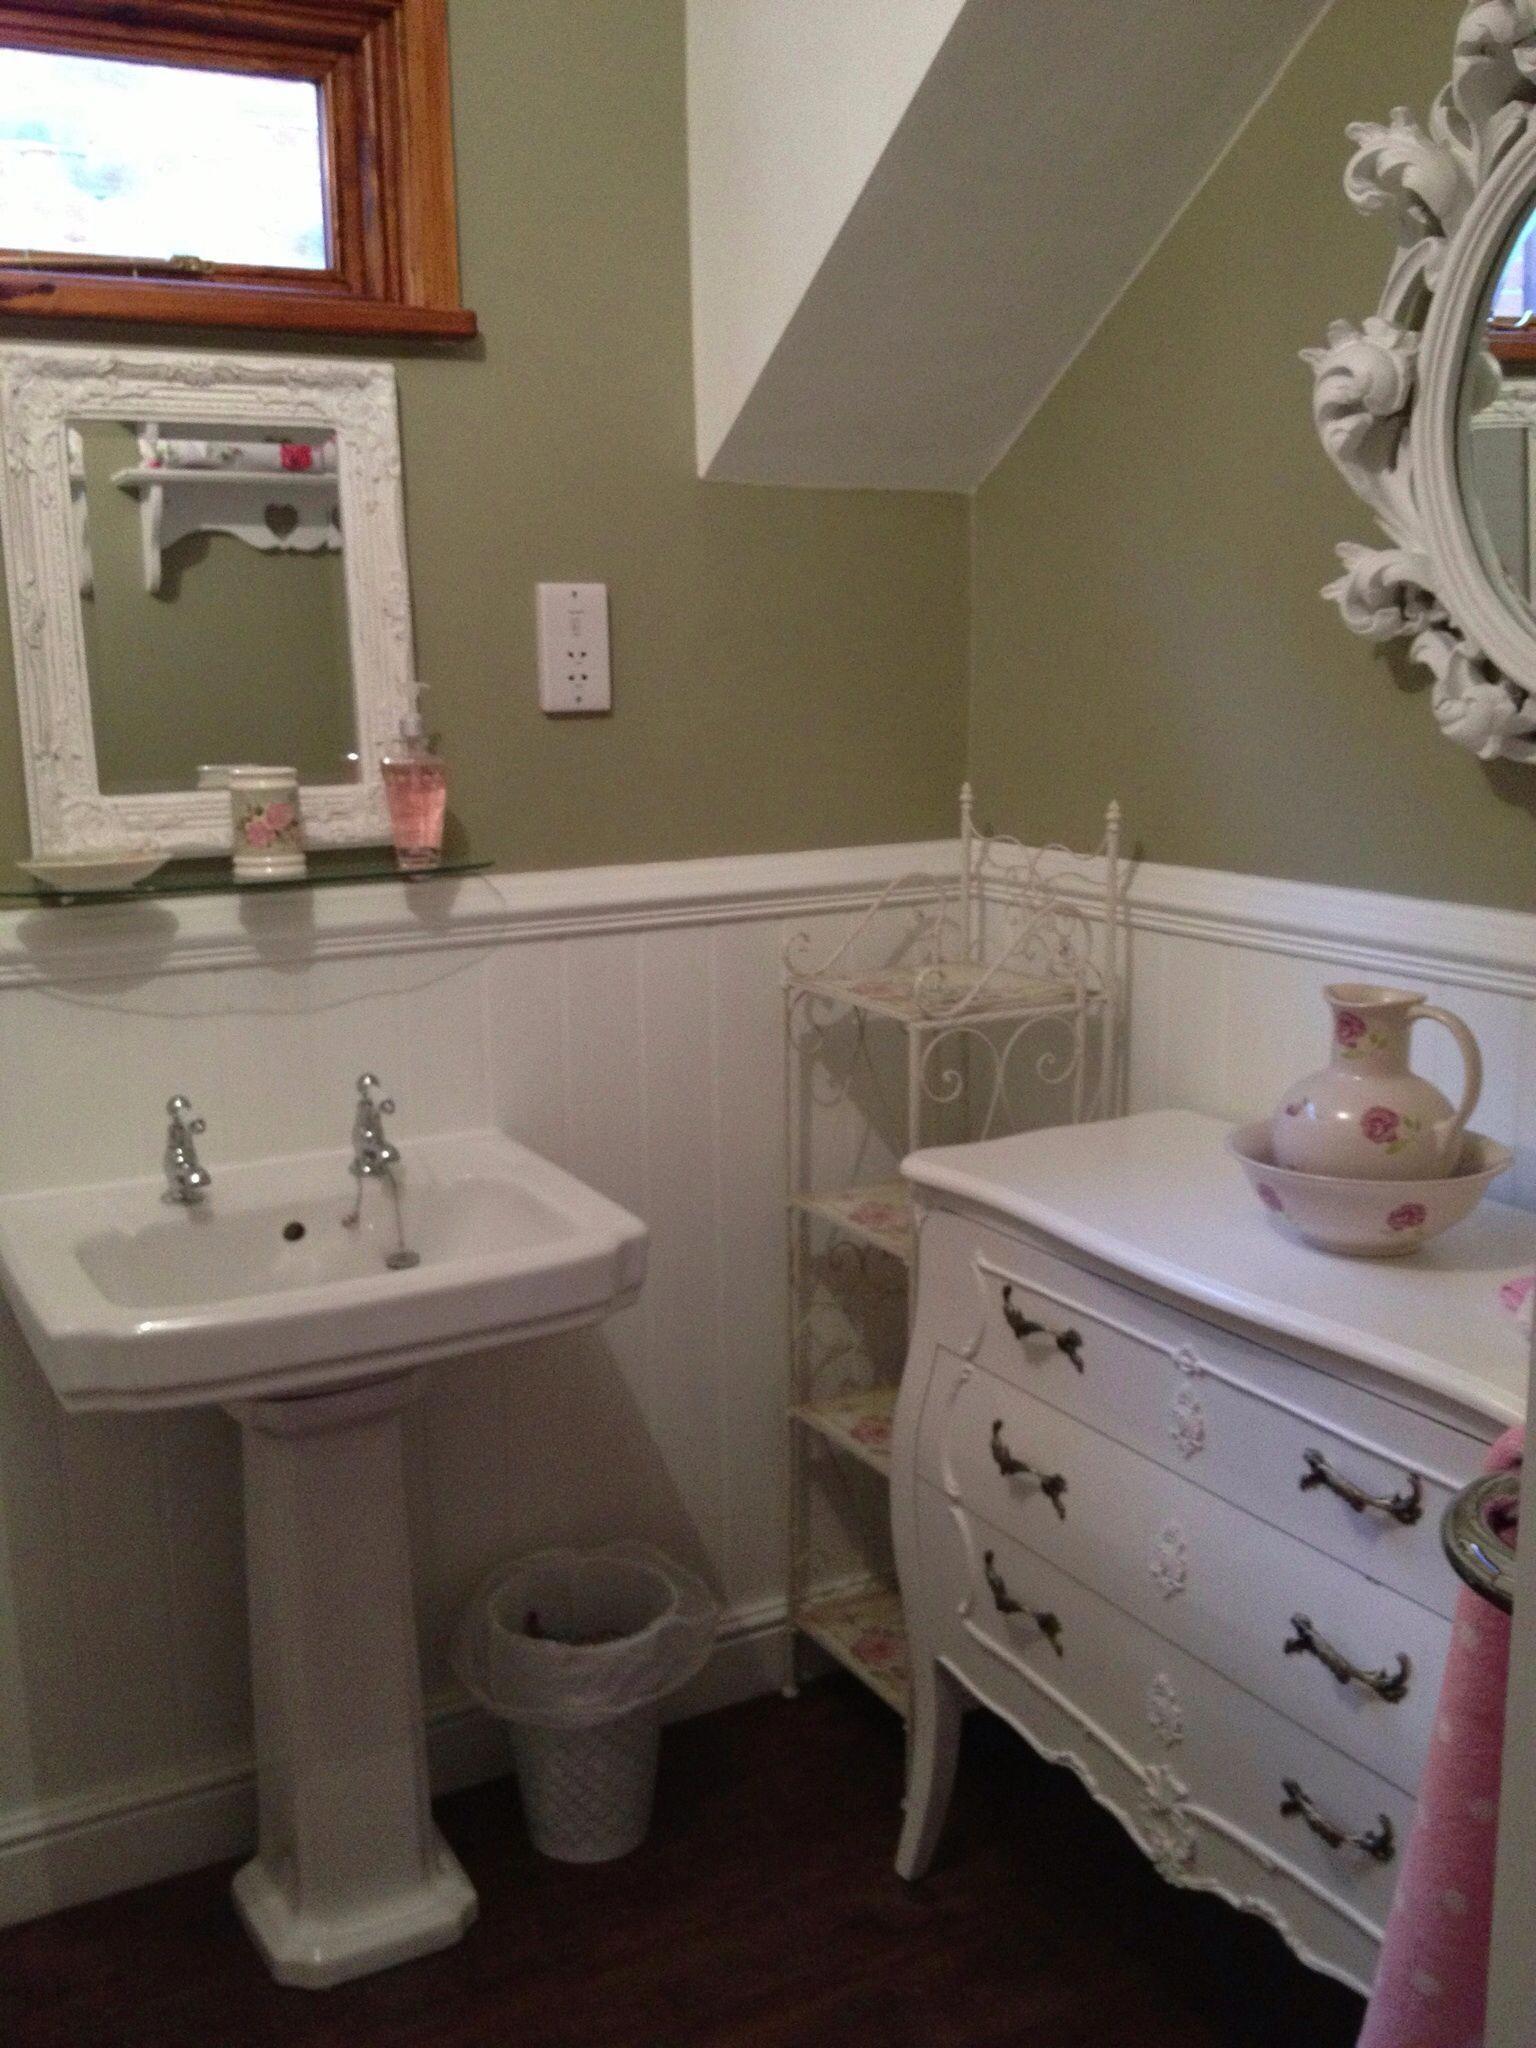 12 Inspirations For Home Improvement With Spanish Home Decorating Ideas: Navigate To The Original Site Around Bathroom Shower Decor